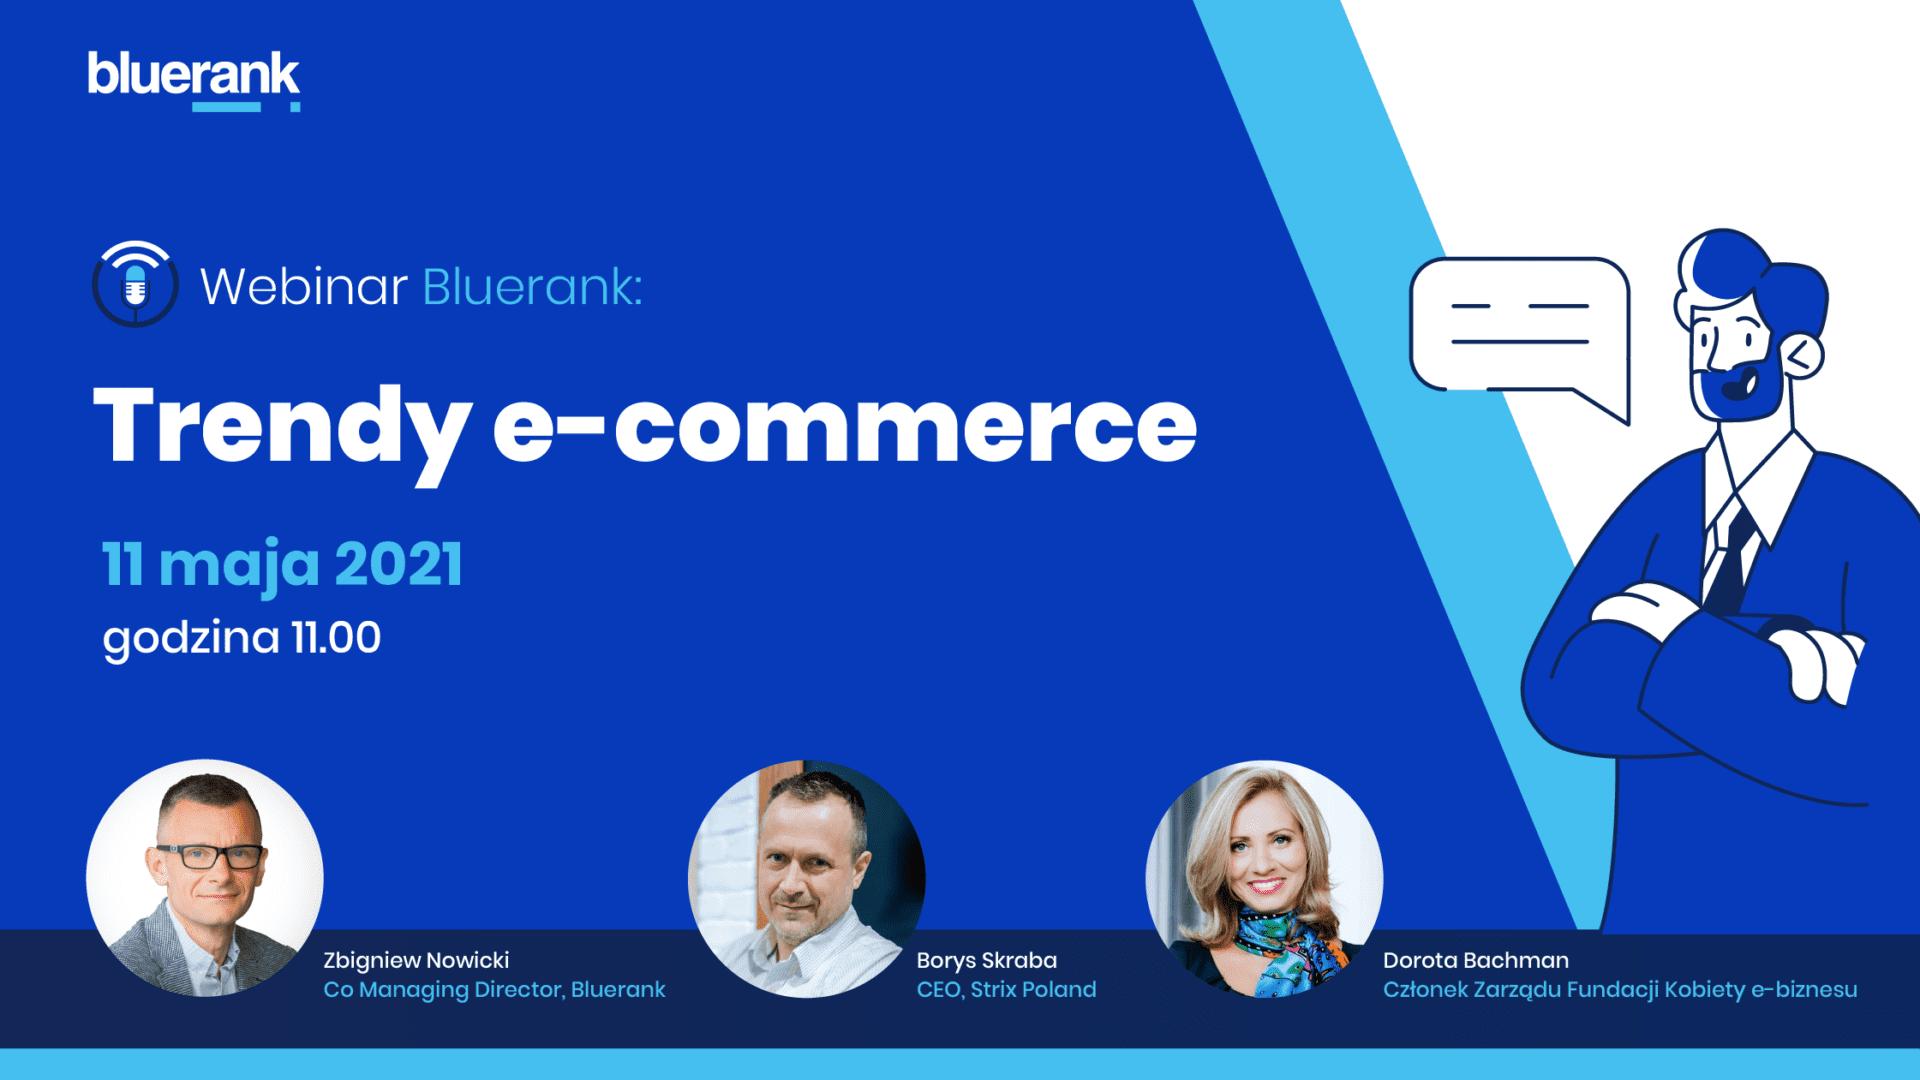 "Webinar ,,Trendy w e-commerce"" pod patronatem e-Izby"